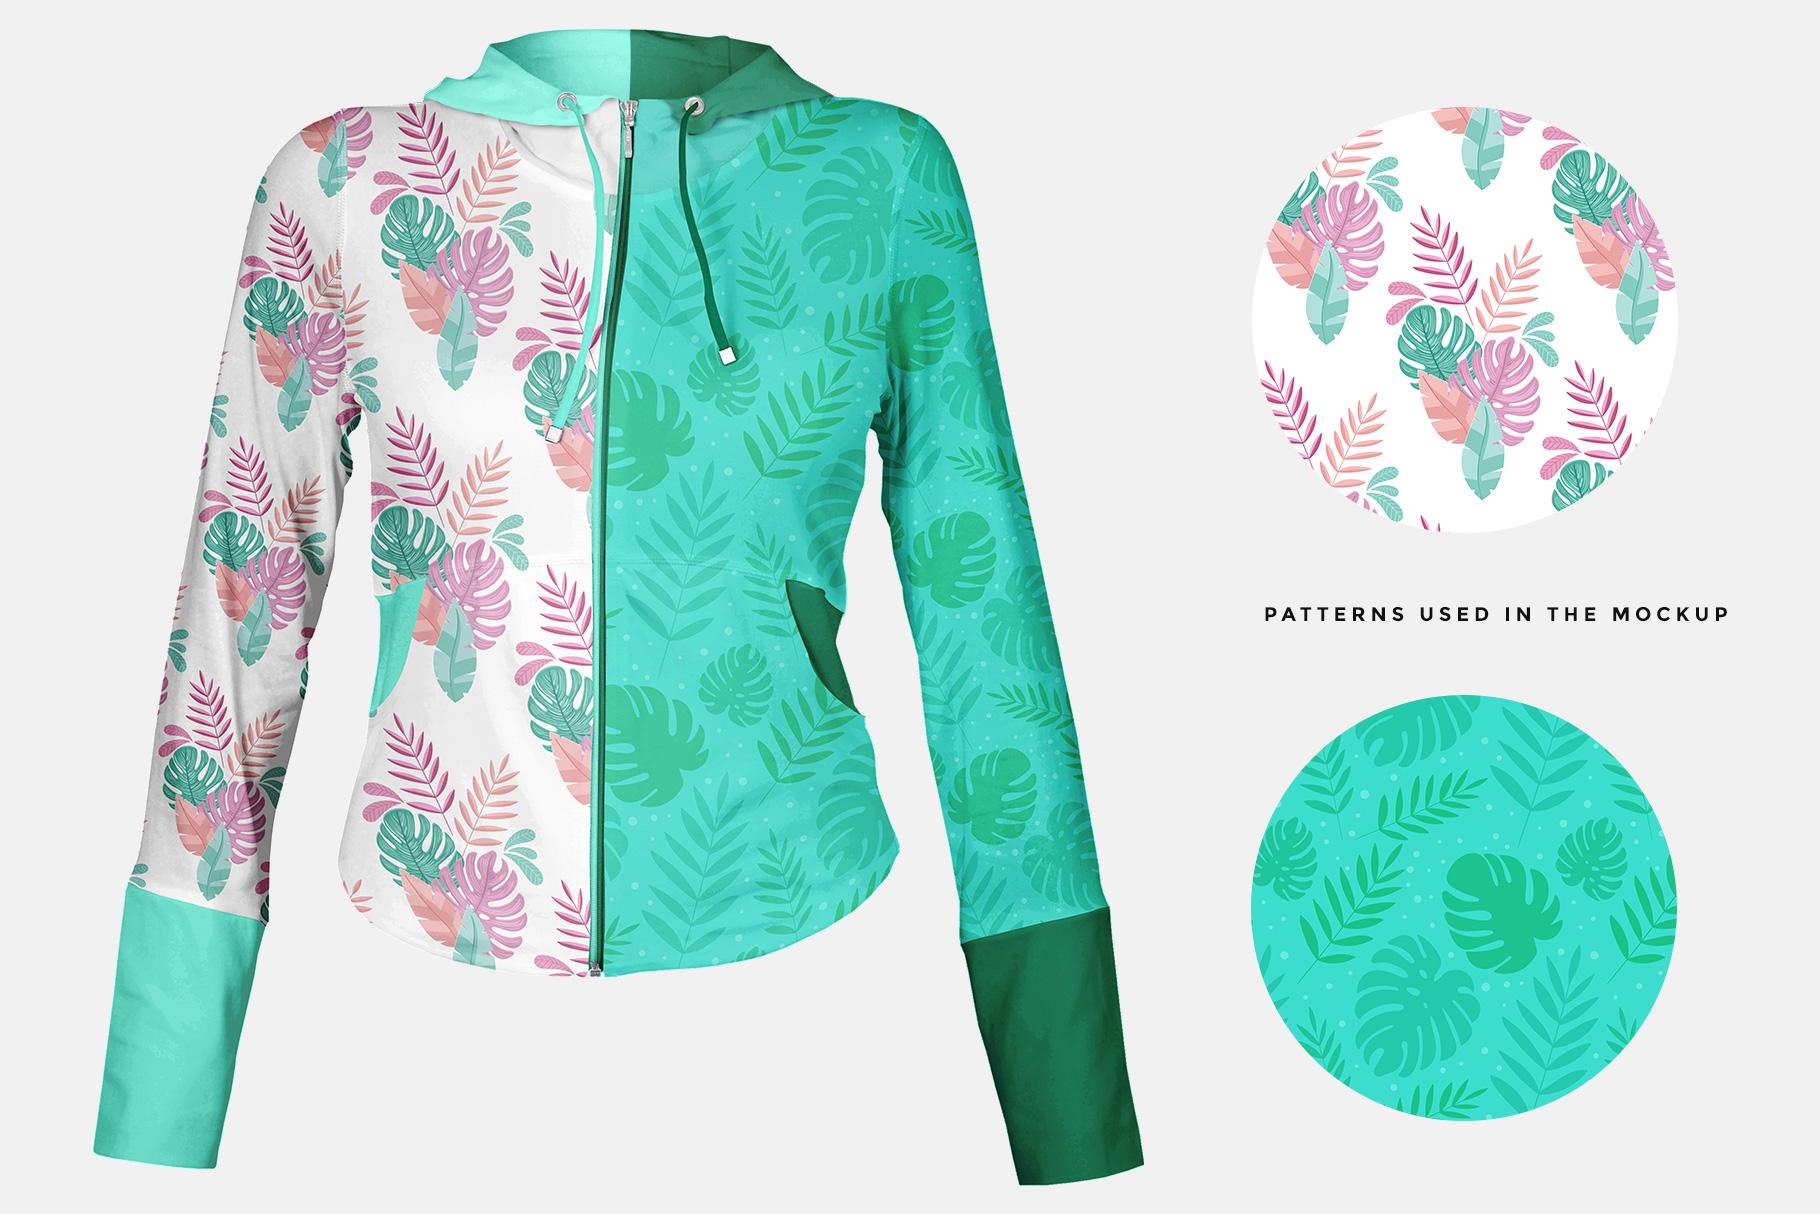 Patterns used in the female zip front hoodie mockup